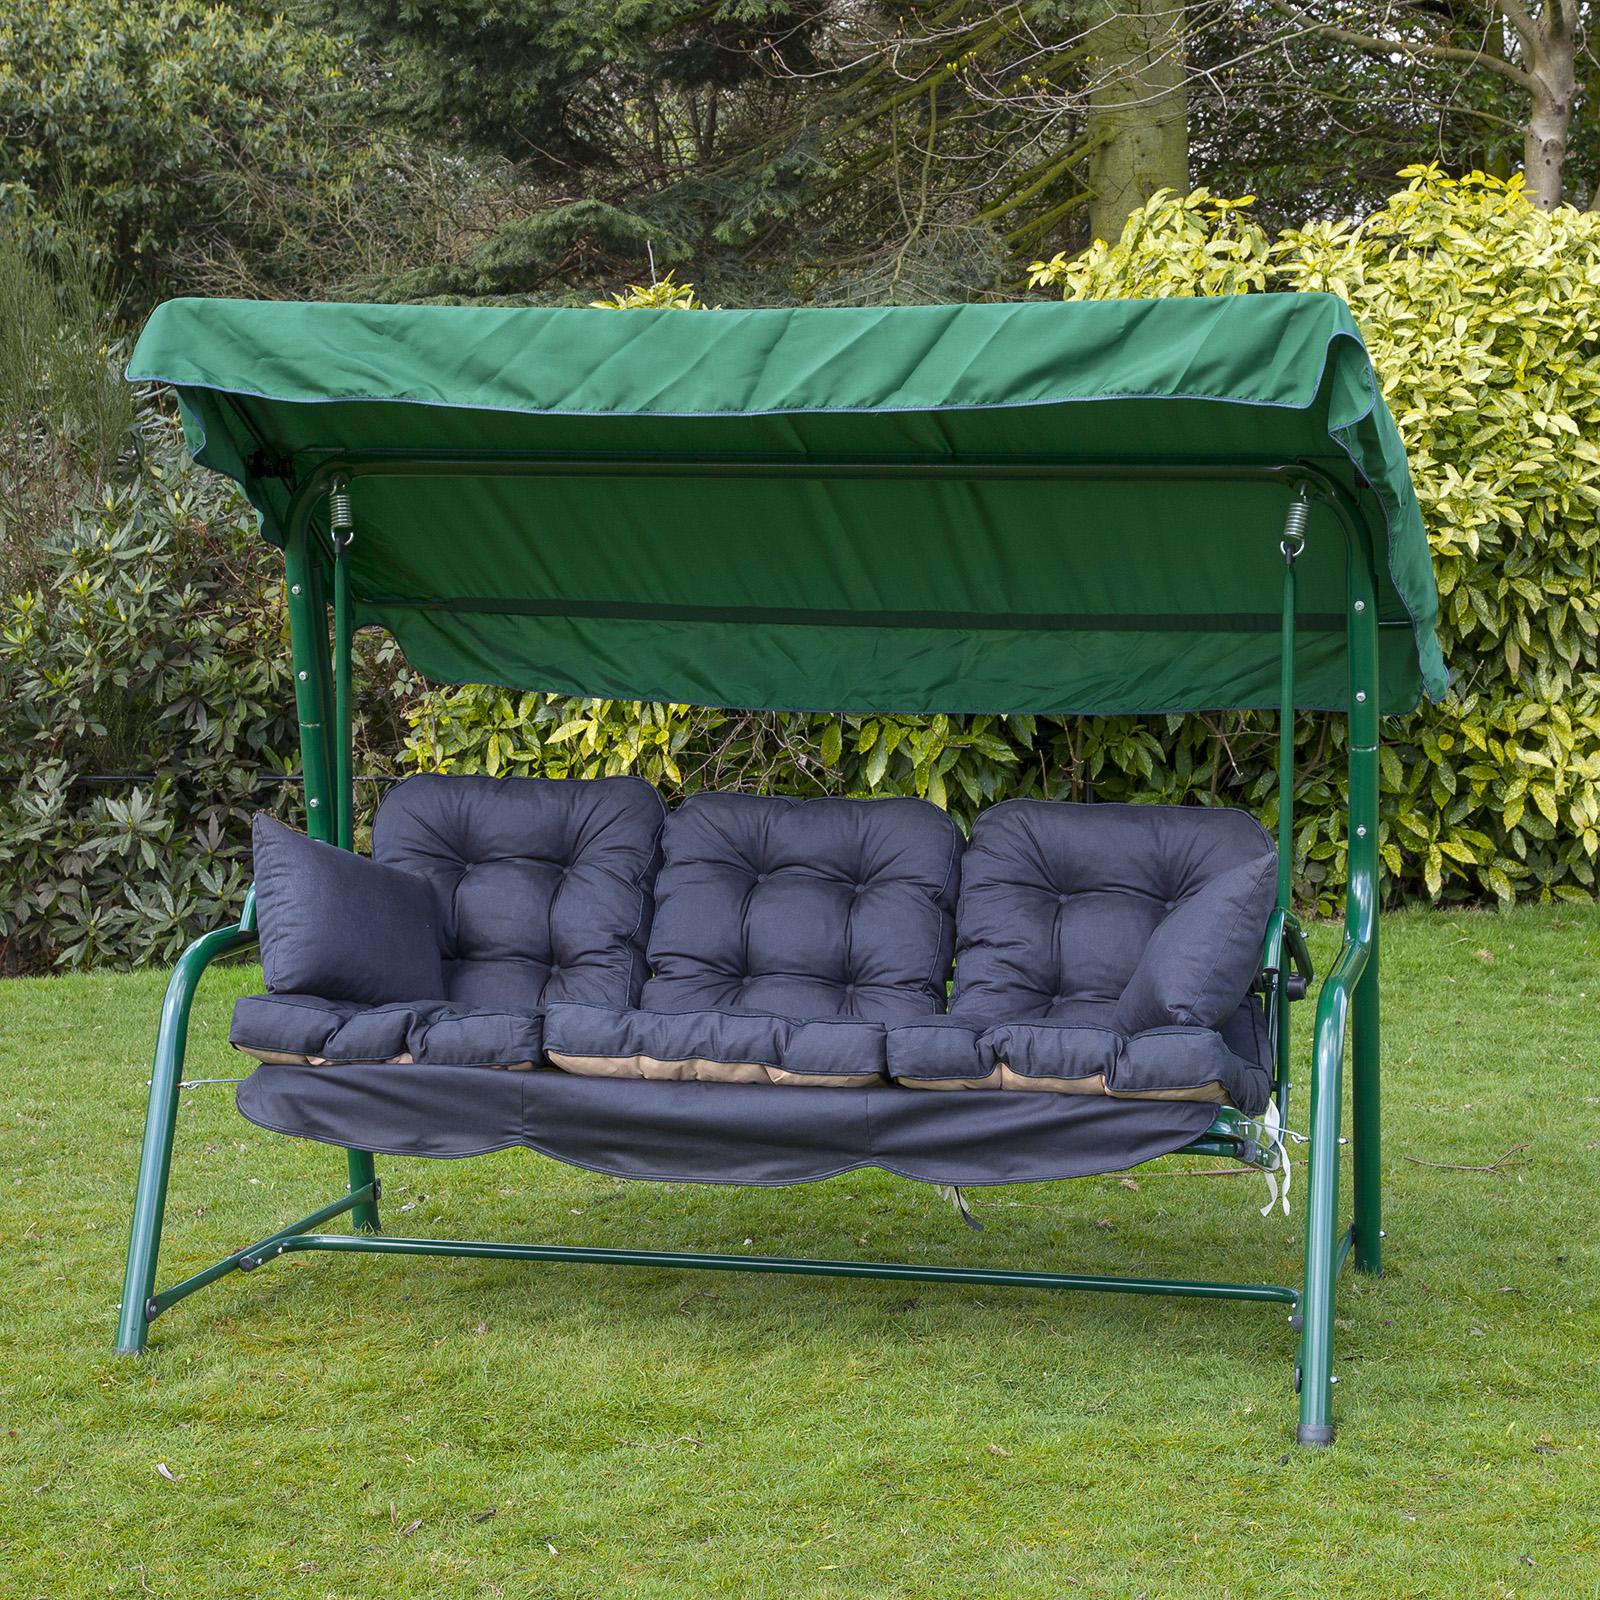 Garden 3 Seater Replacement Swing Seat Hammock Cushion Set ...